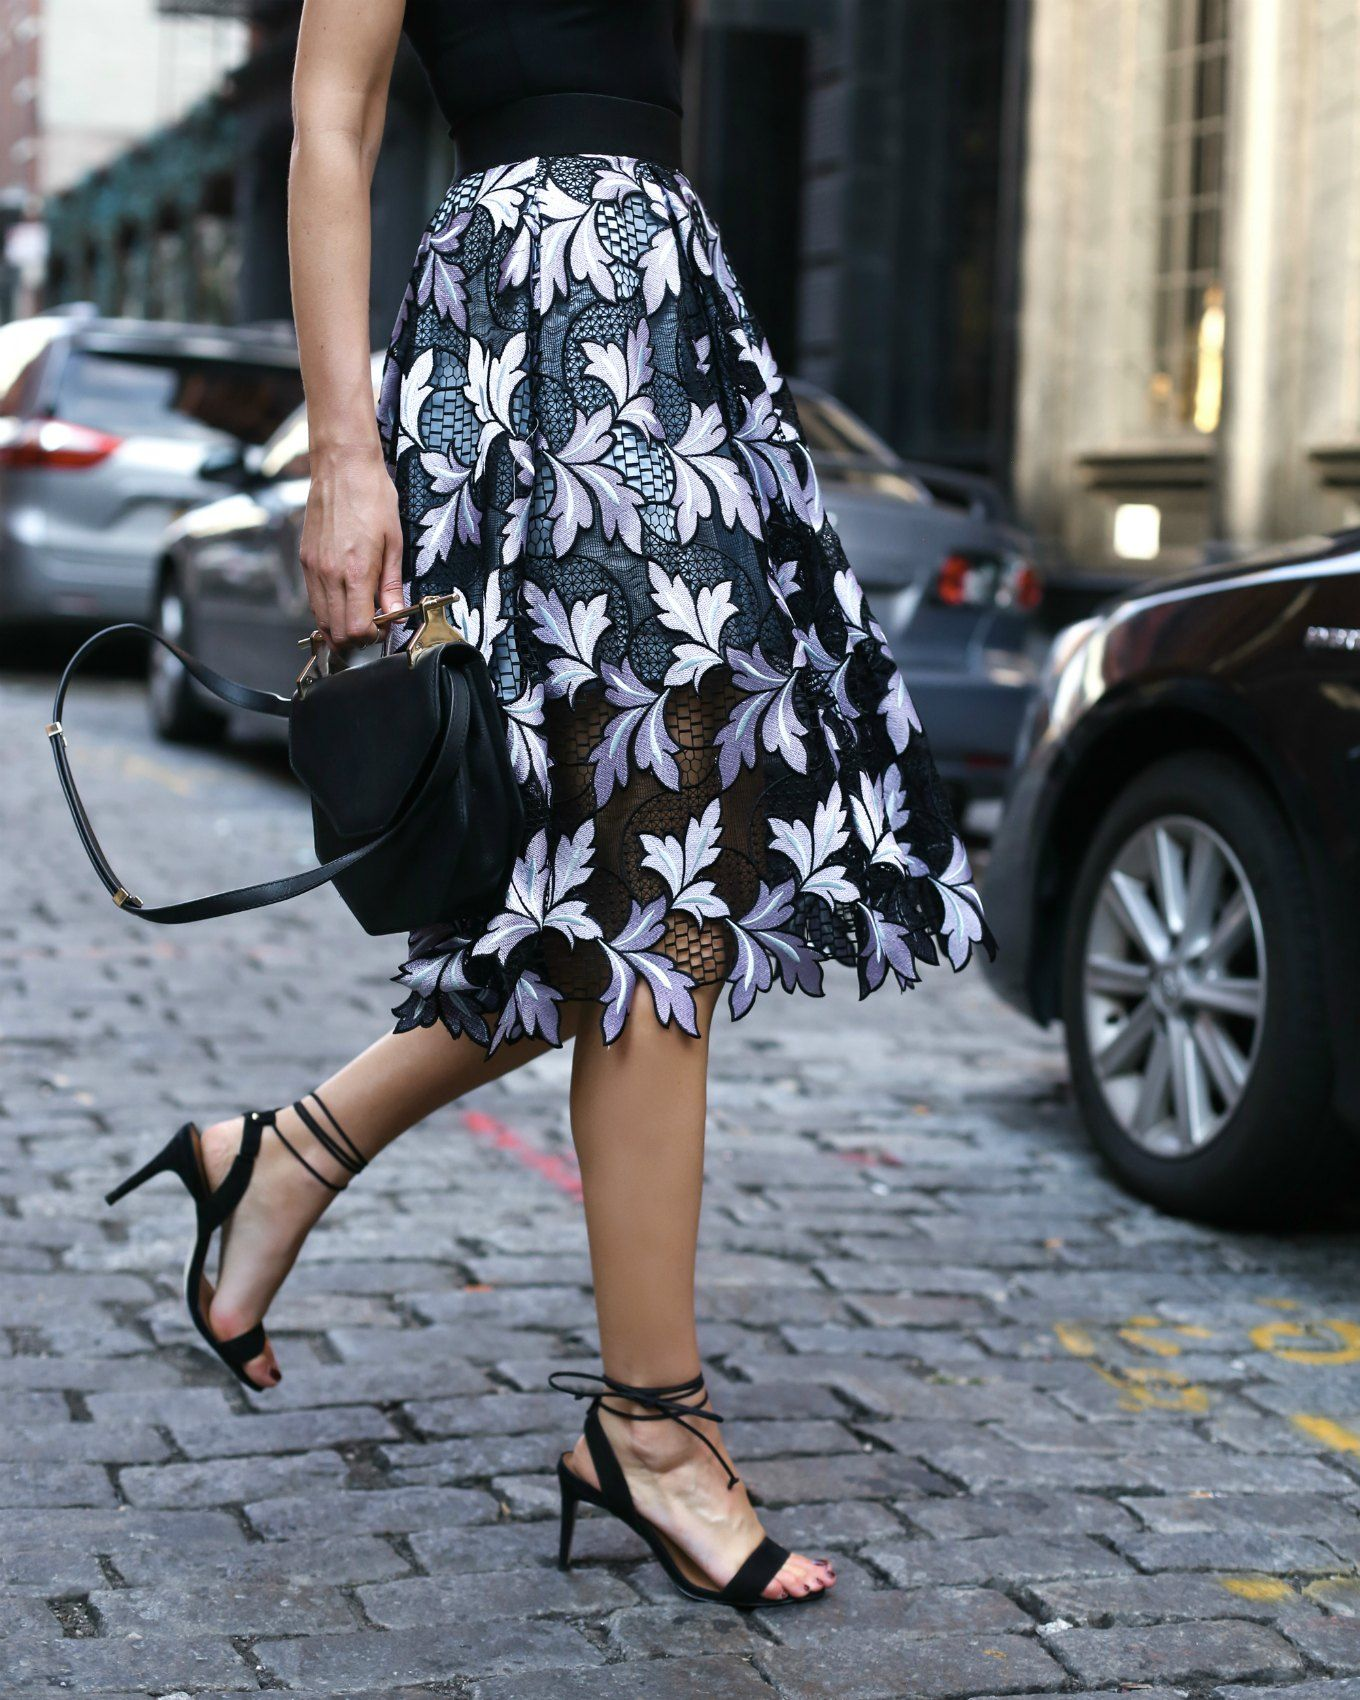 Lace Midi Skirt and Black Bodysuit   MEMORANDUM, formerly The Classy Cubicle